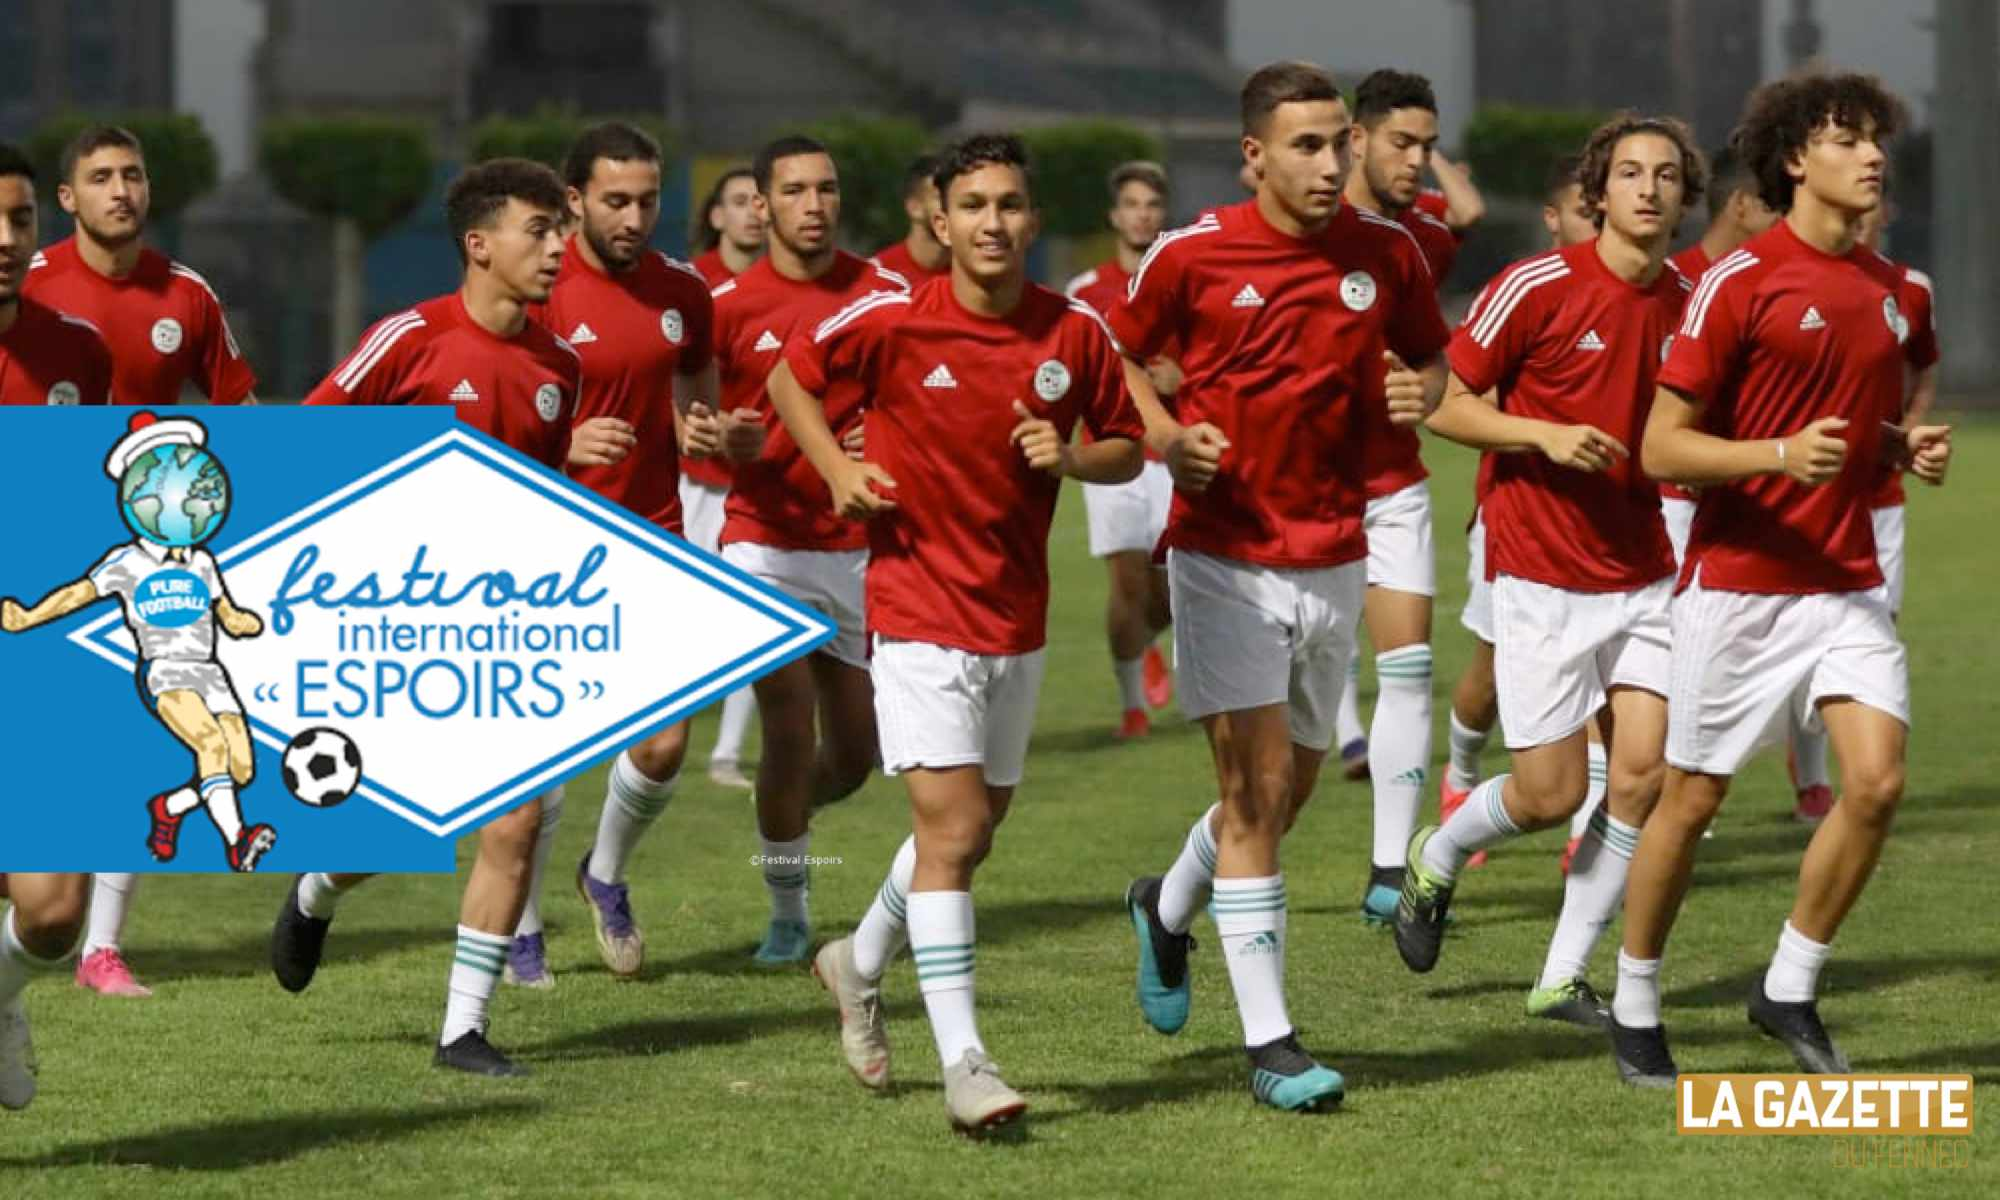 U20 tournoi de toulon algerie festival international